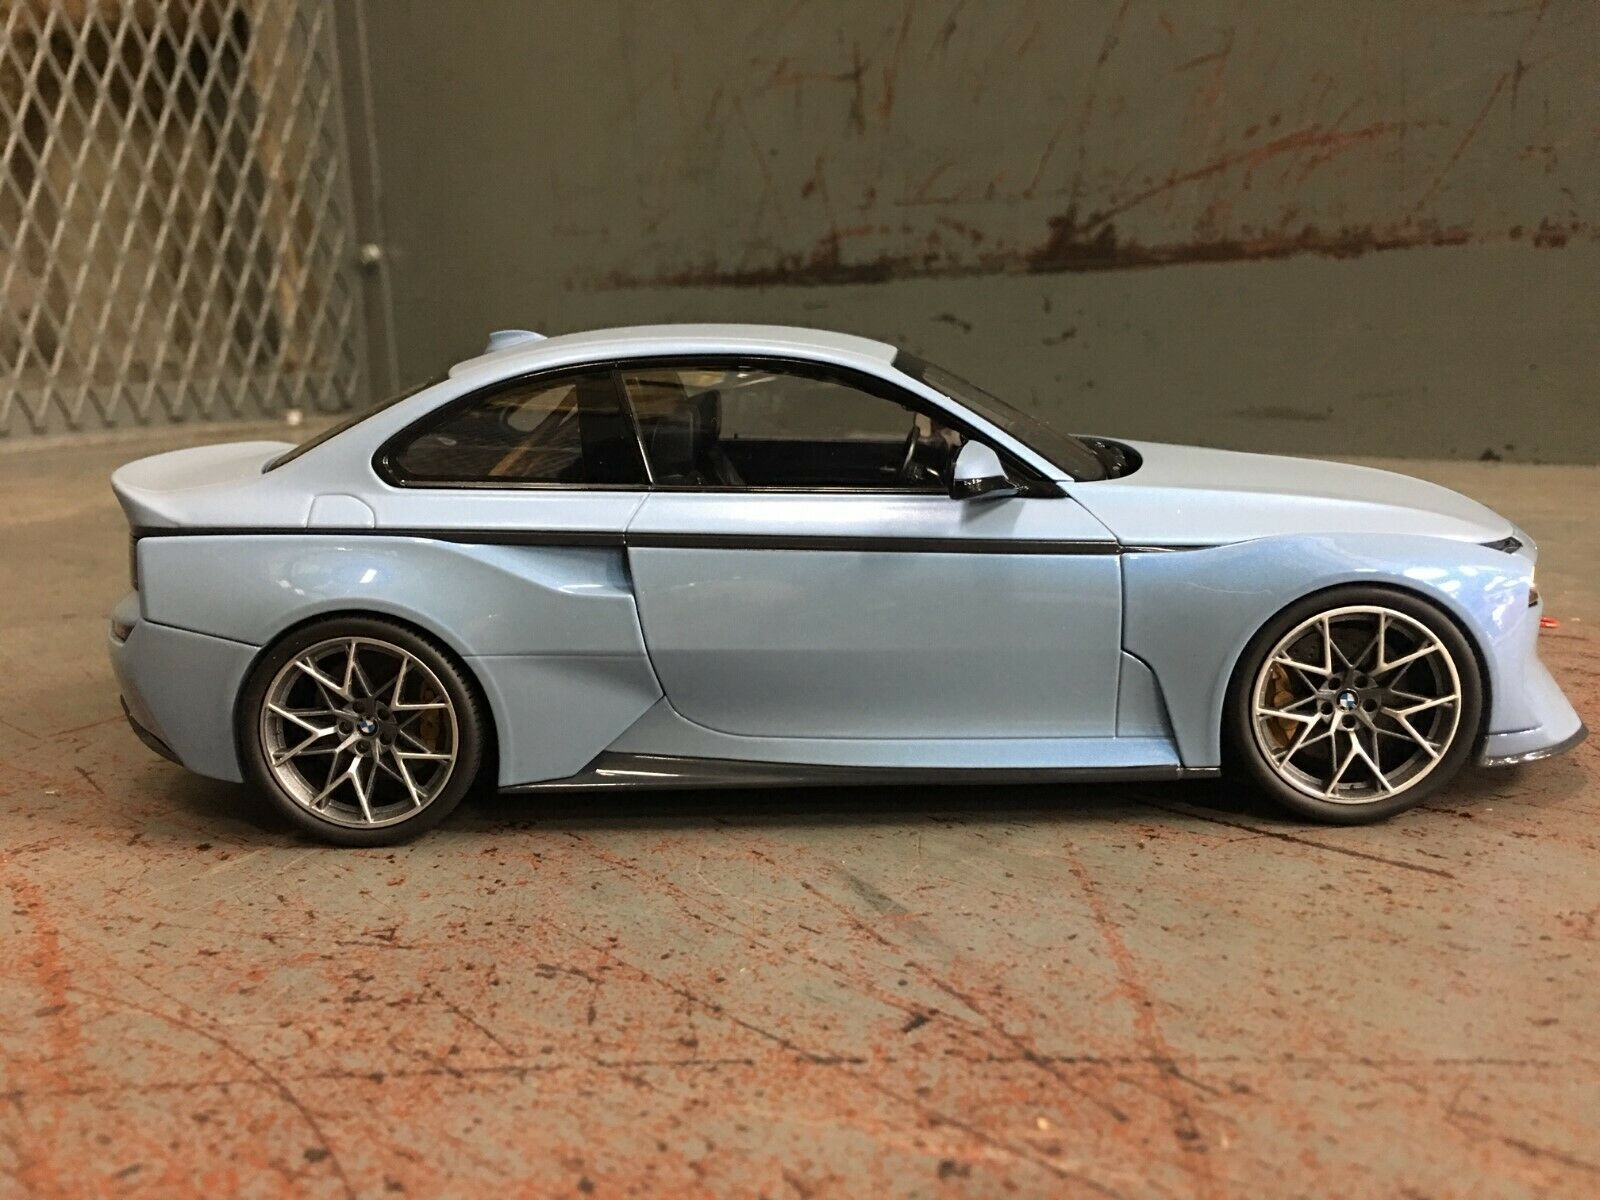 BMW 2002 1 18 Homage M2 Diecast Miniature Model by Norev OEM 80432454780